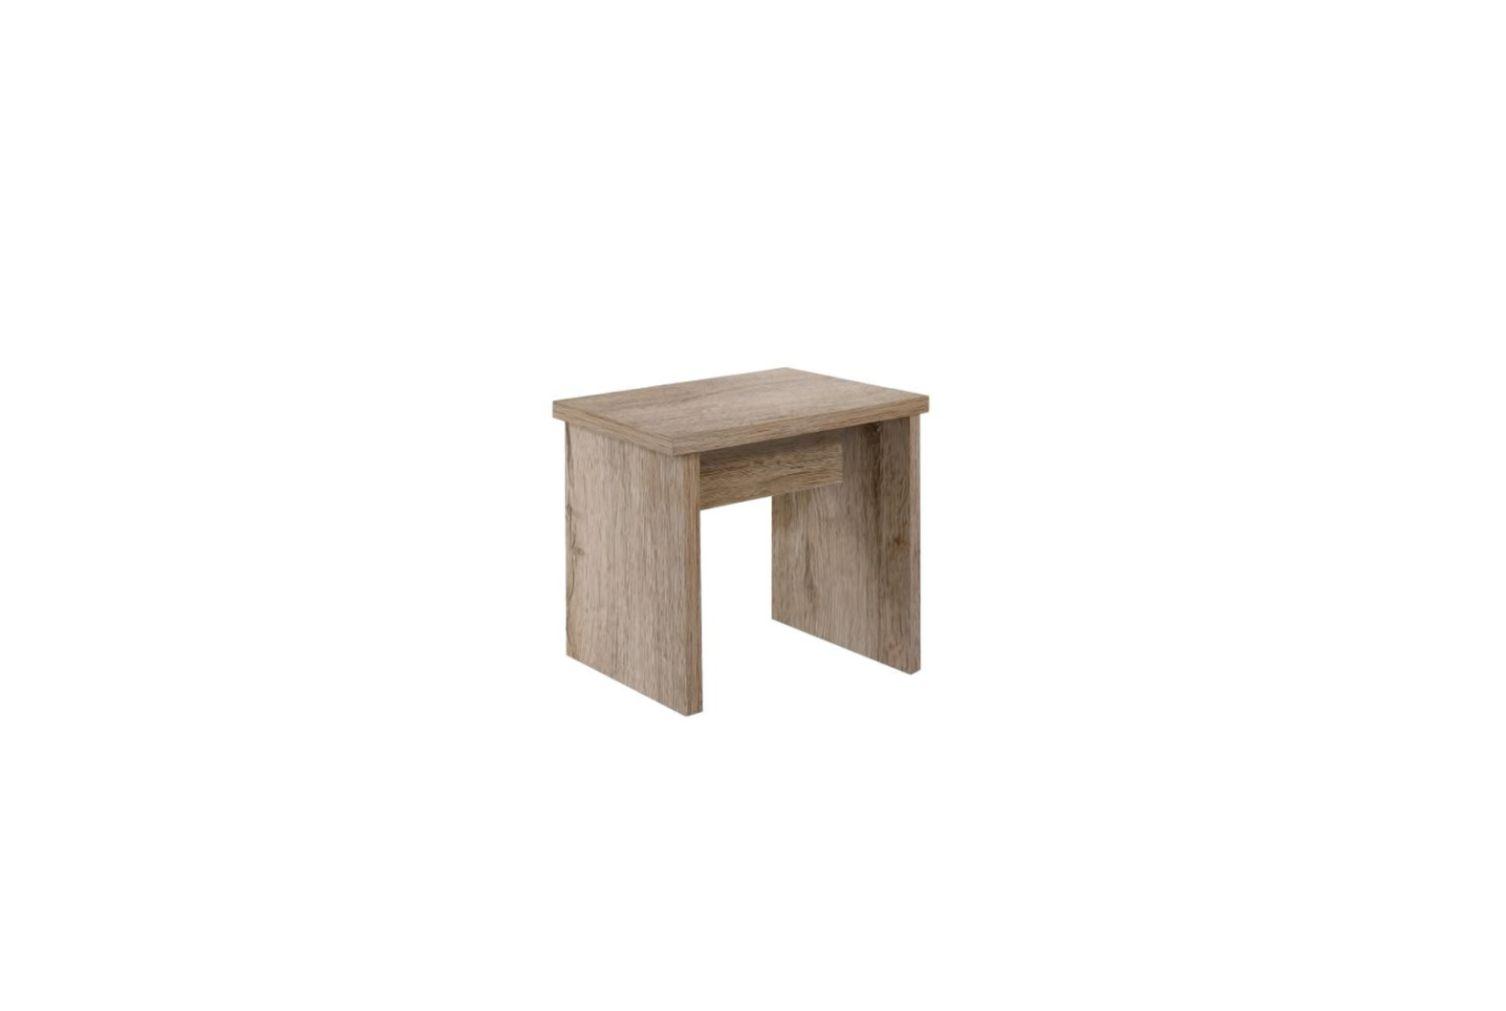 Sitzhocker Neu Stuhl Dielenhocker Hocker Barhocker Holz Modern